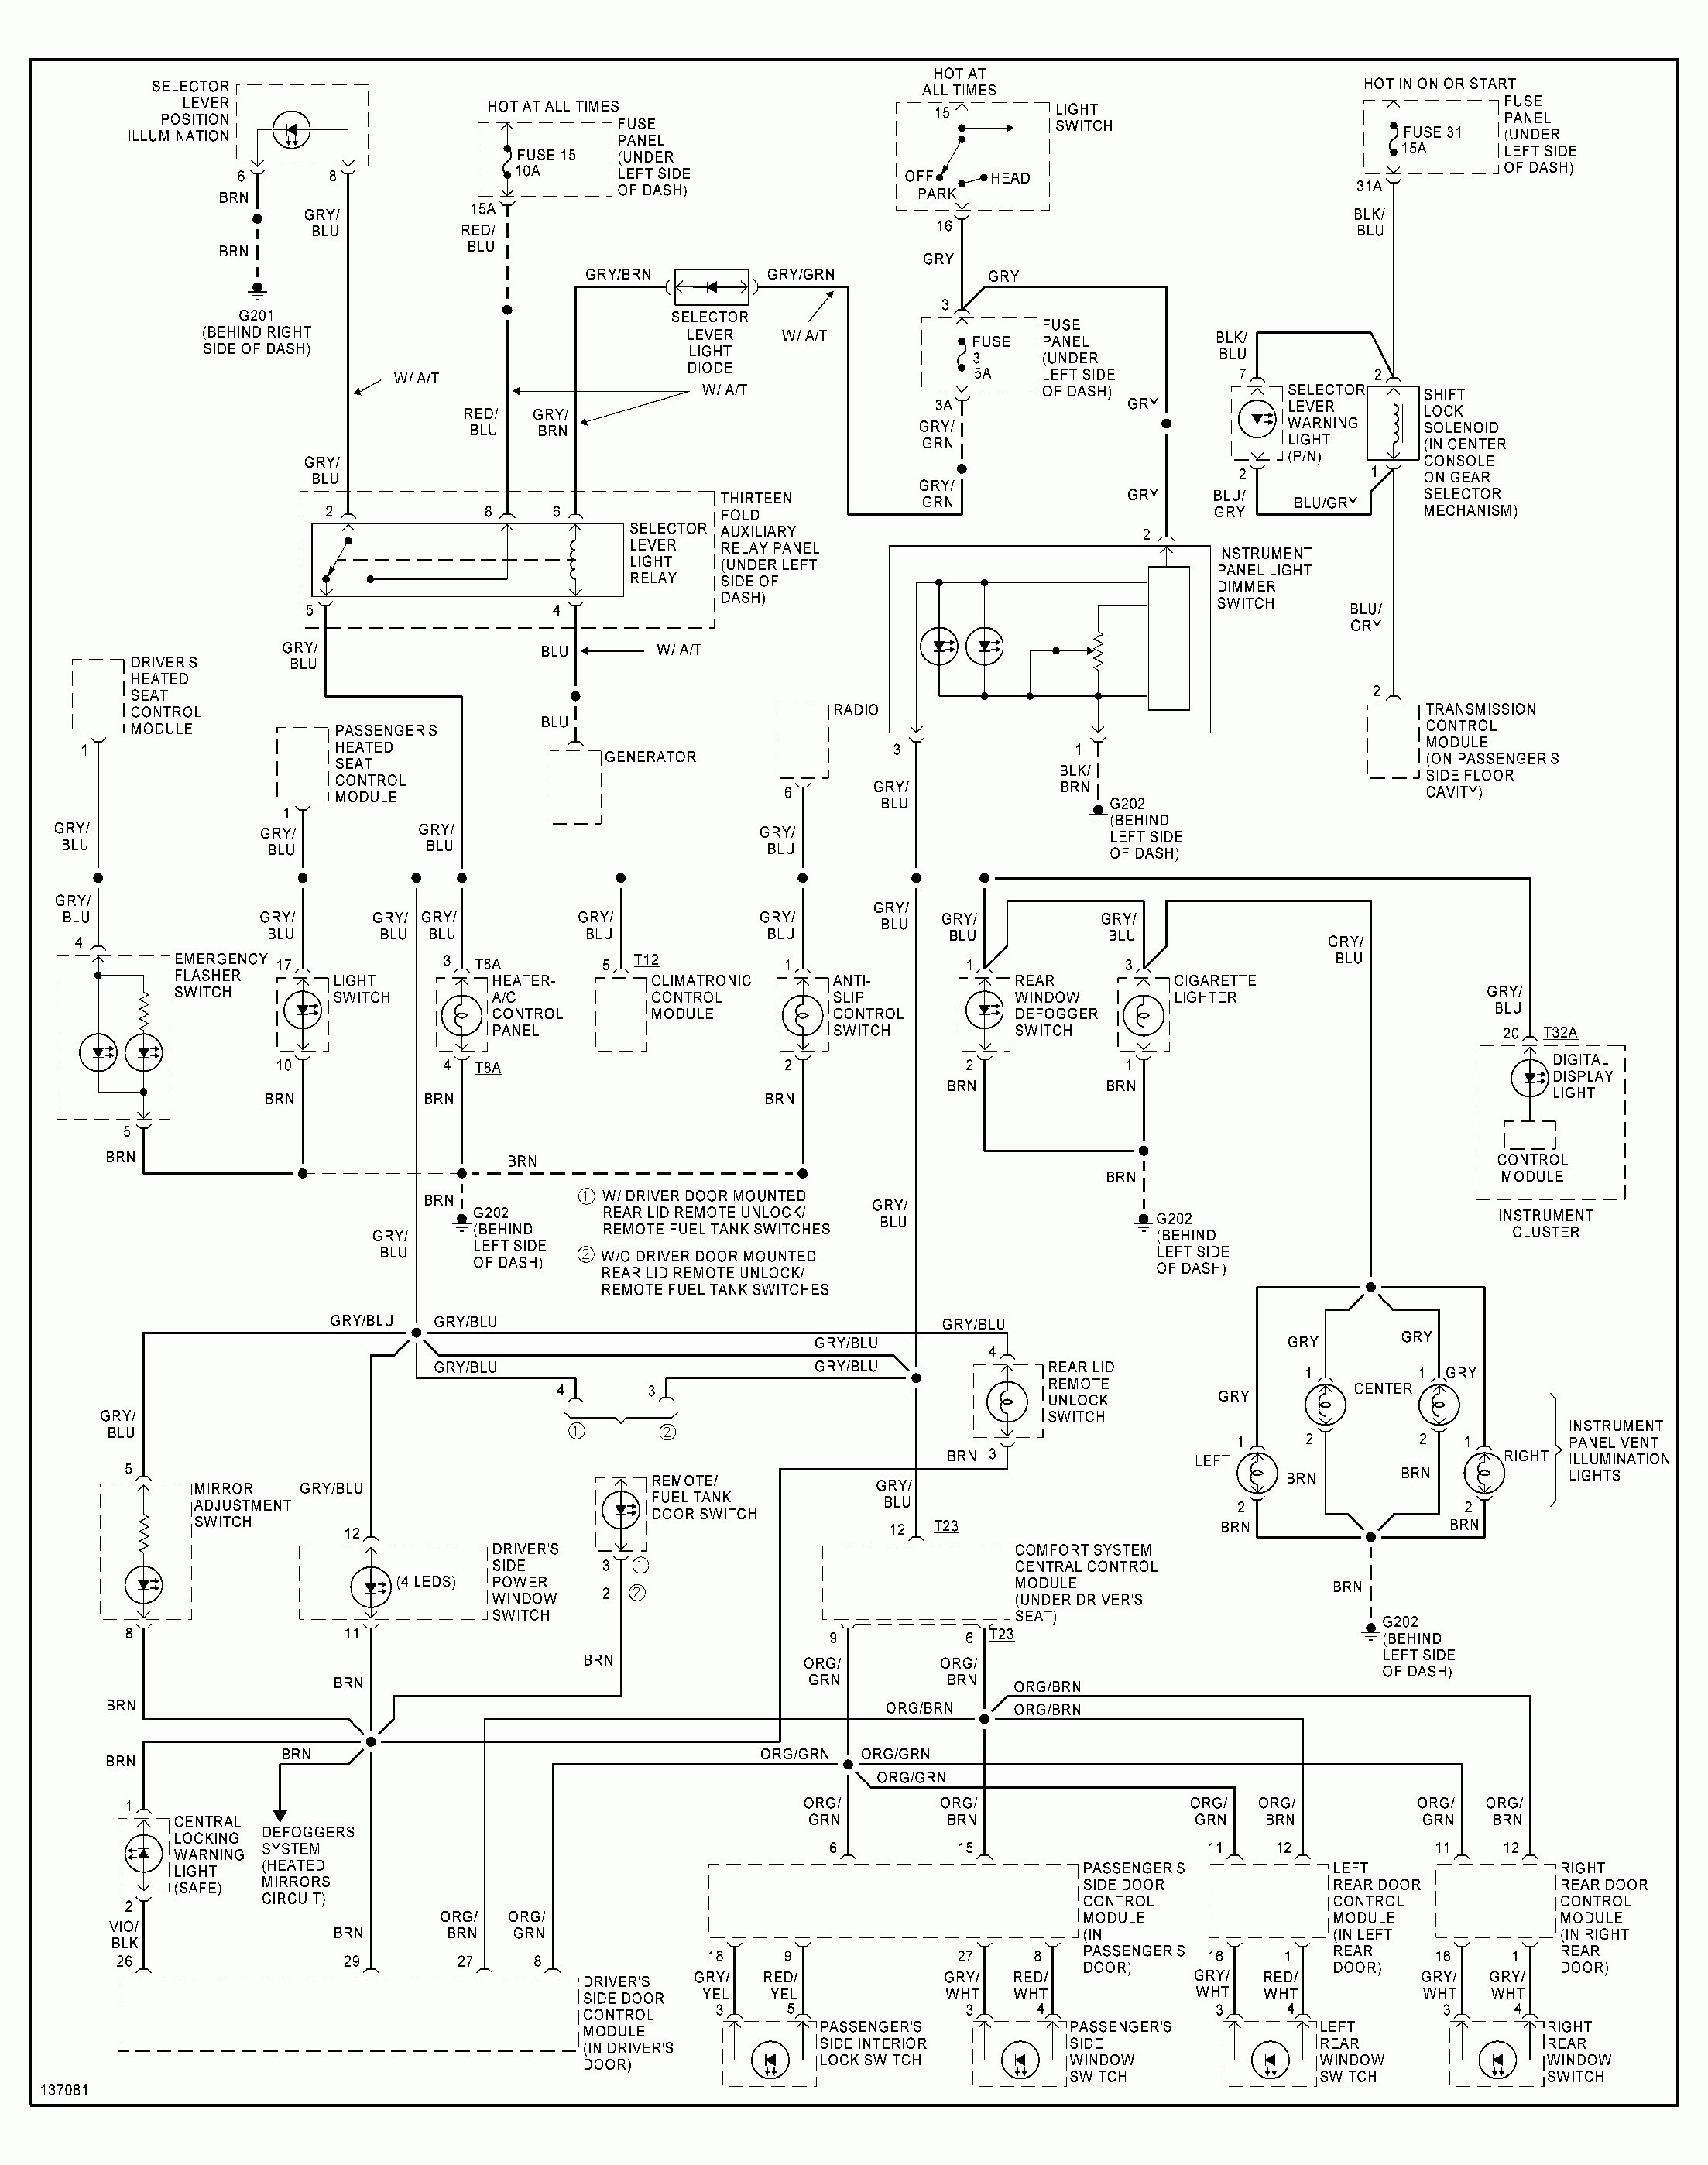 2010 Mazda 3 Wiring Diagram Diagram] Volkswagen Vw Golf Jetta Mk3 A3 Wiring Diagram Of 2010 Mazda 3 Wiring Diagram